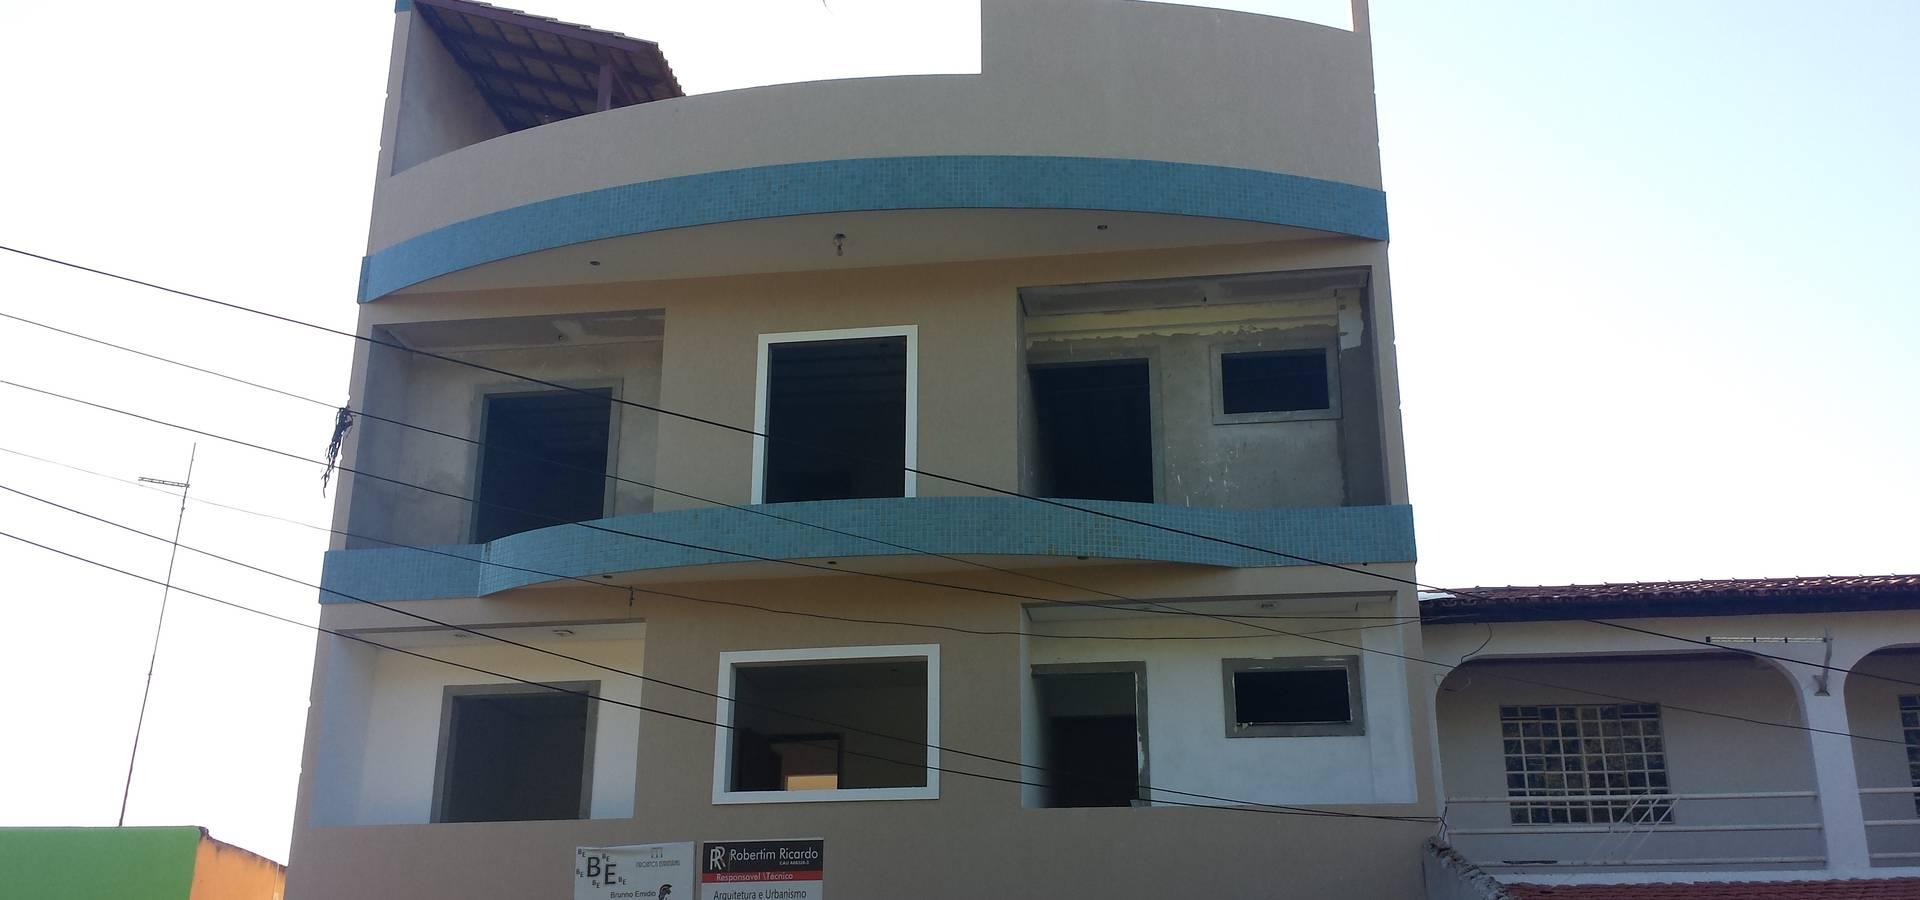 Arquiteto Robertim Ricardo